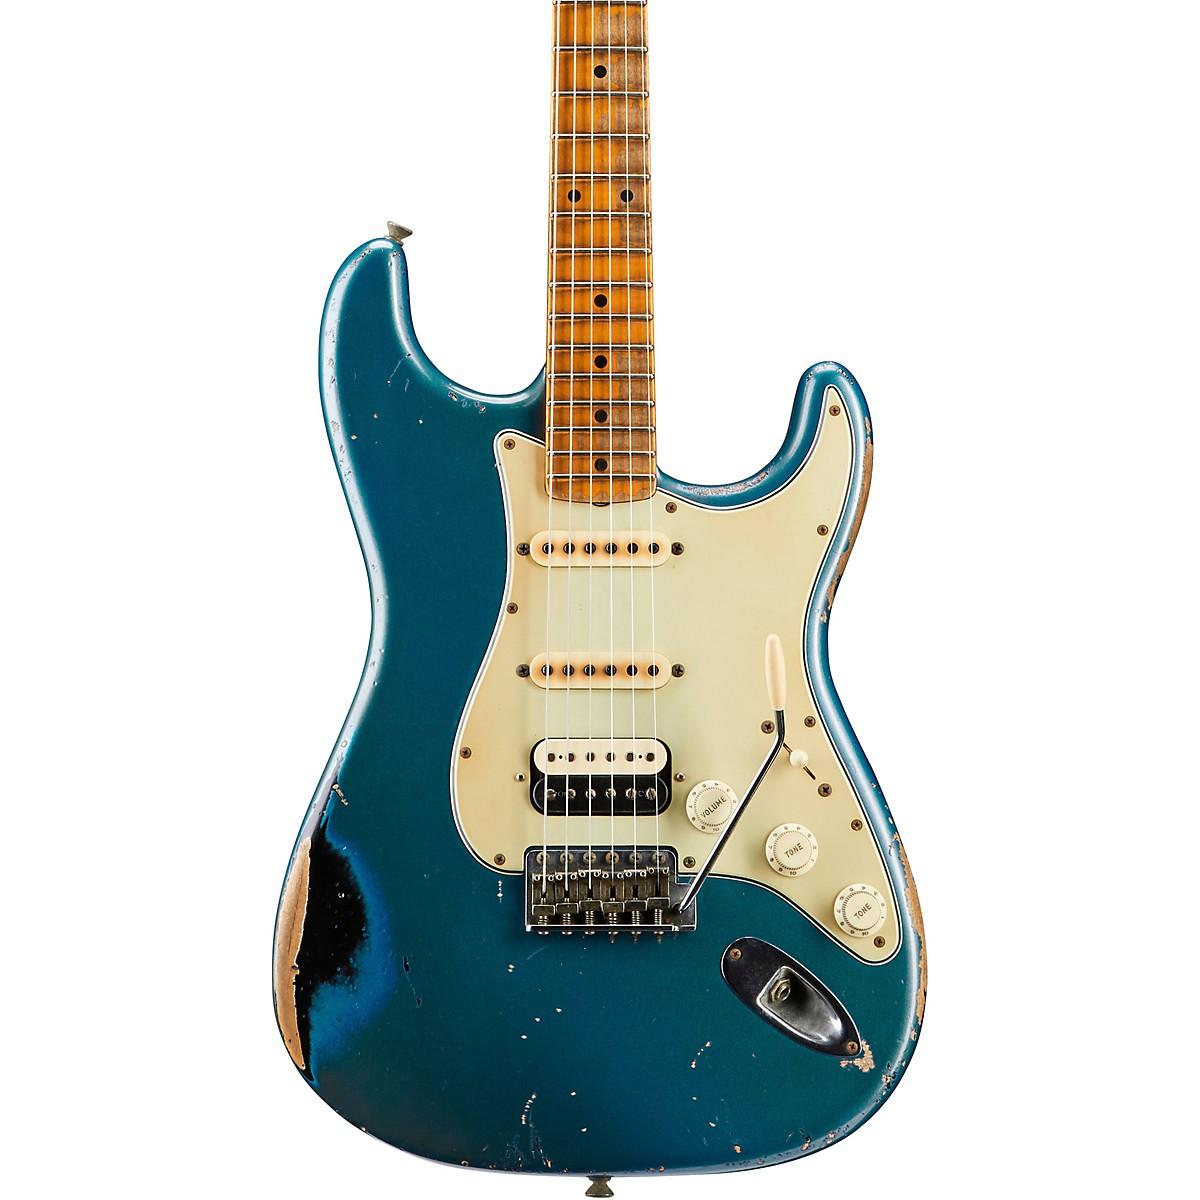 Fender Custom Shop 1962 Heavy Relic Stratocaster HSS Maple Fingerboard Masterbuilt by John Cruz